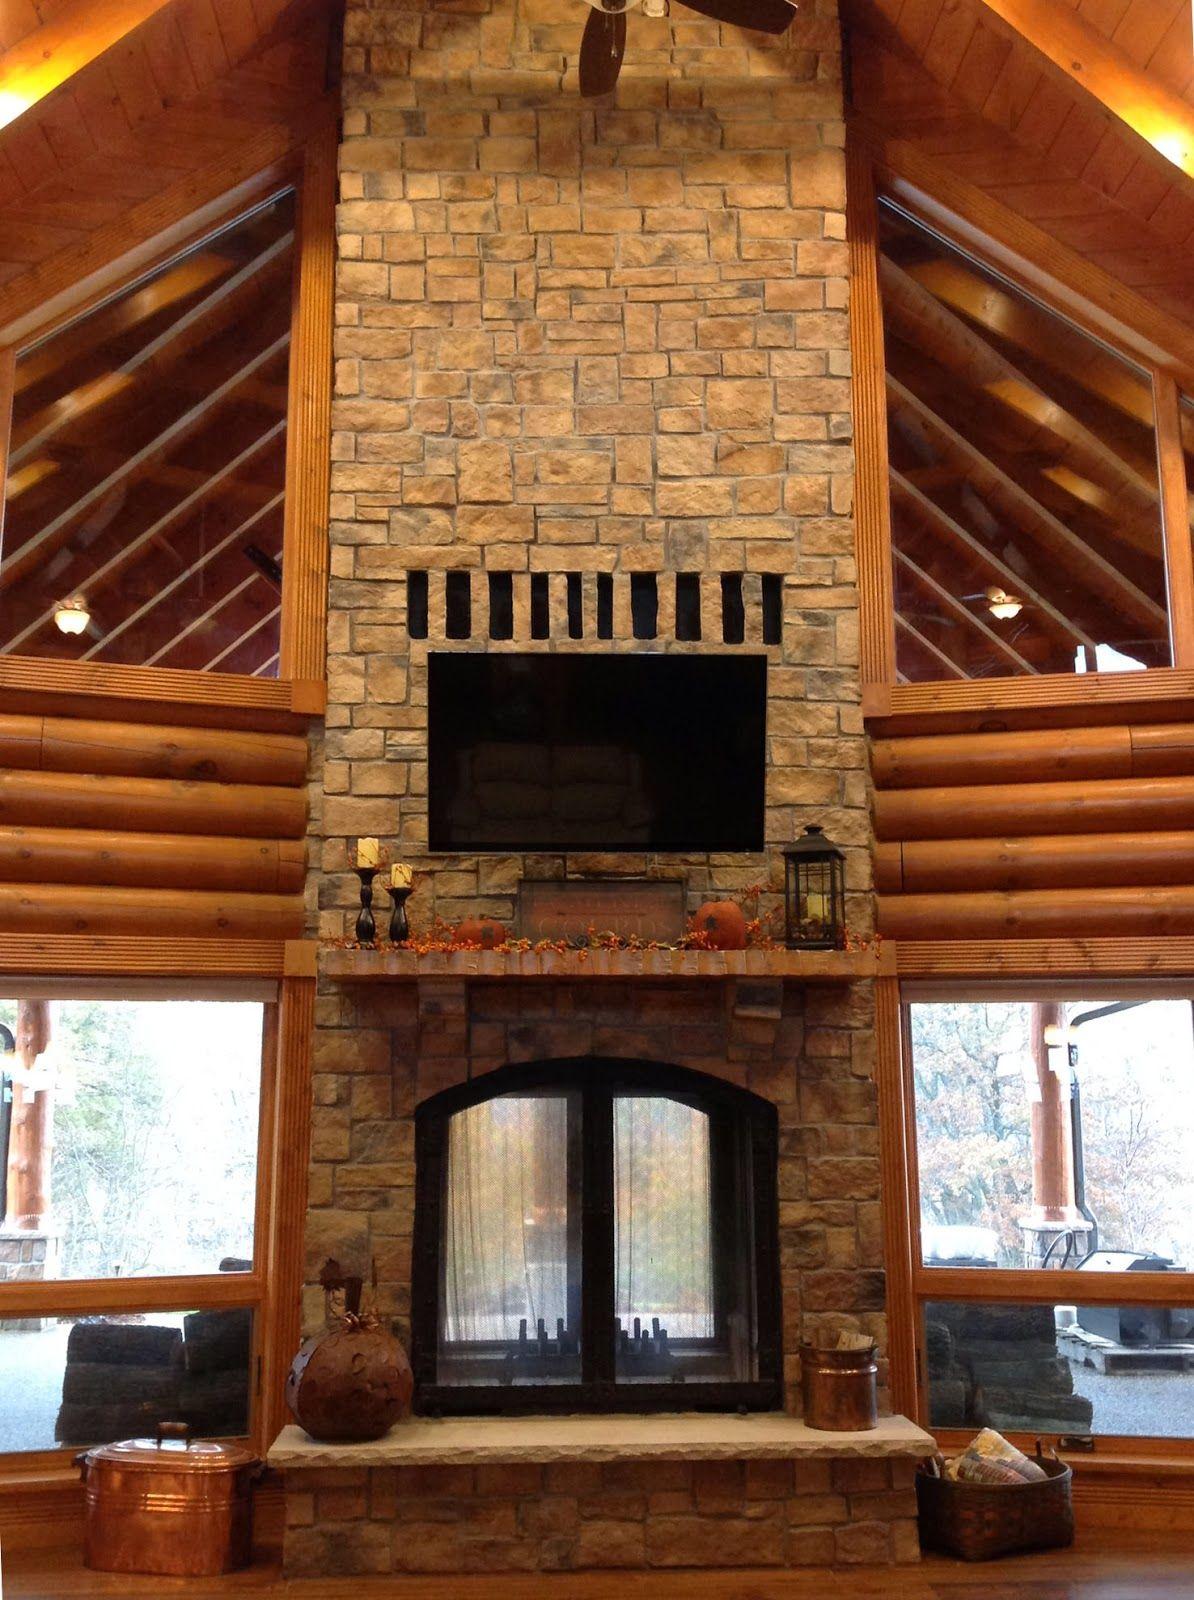 Acucraft Fireplaces Custom See Through Wood Burning Indoor Outdoor Fireplace Indoor Outdoor Fireplaces Outdoor Wood Fireplace Indoor Fireplace